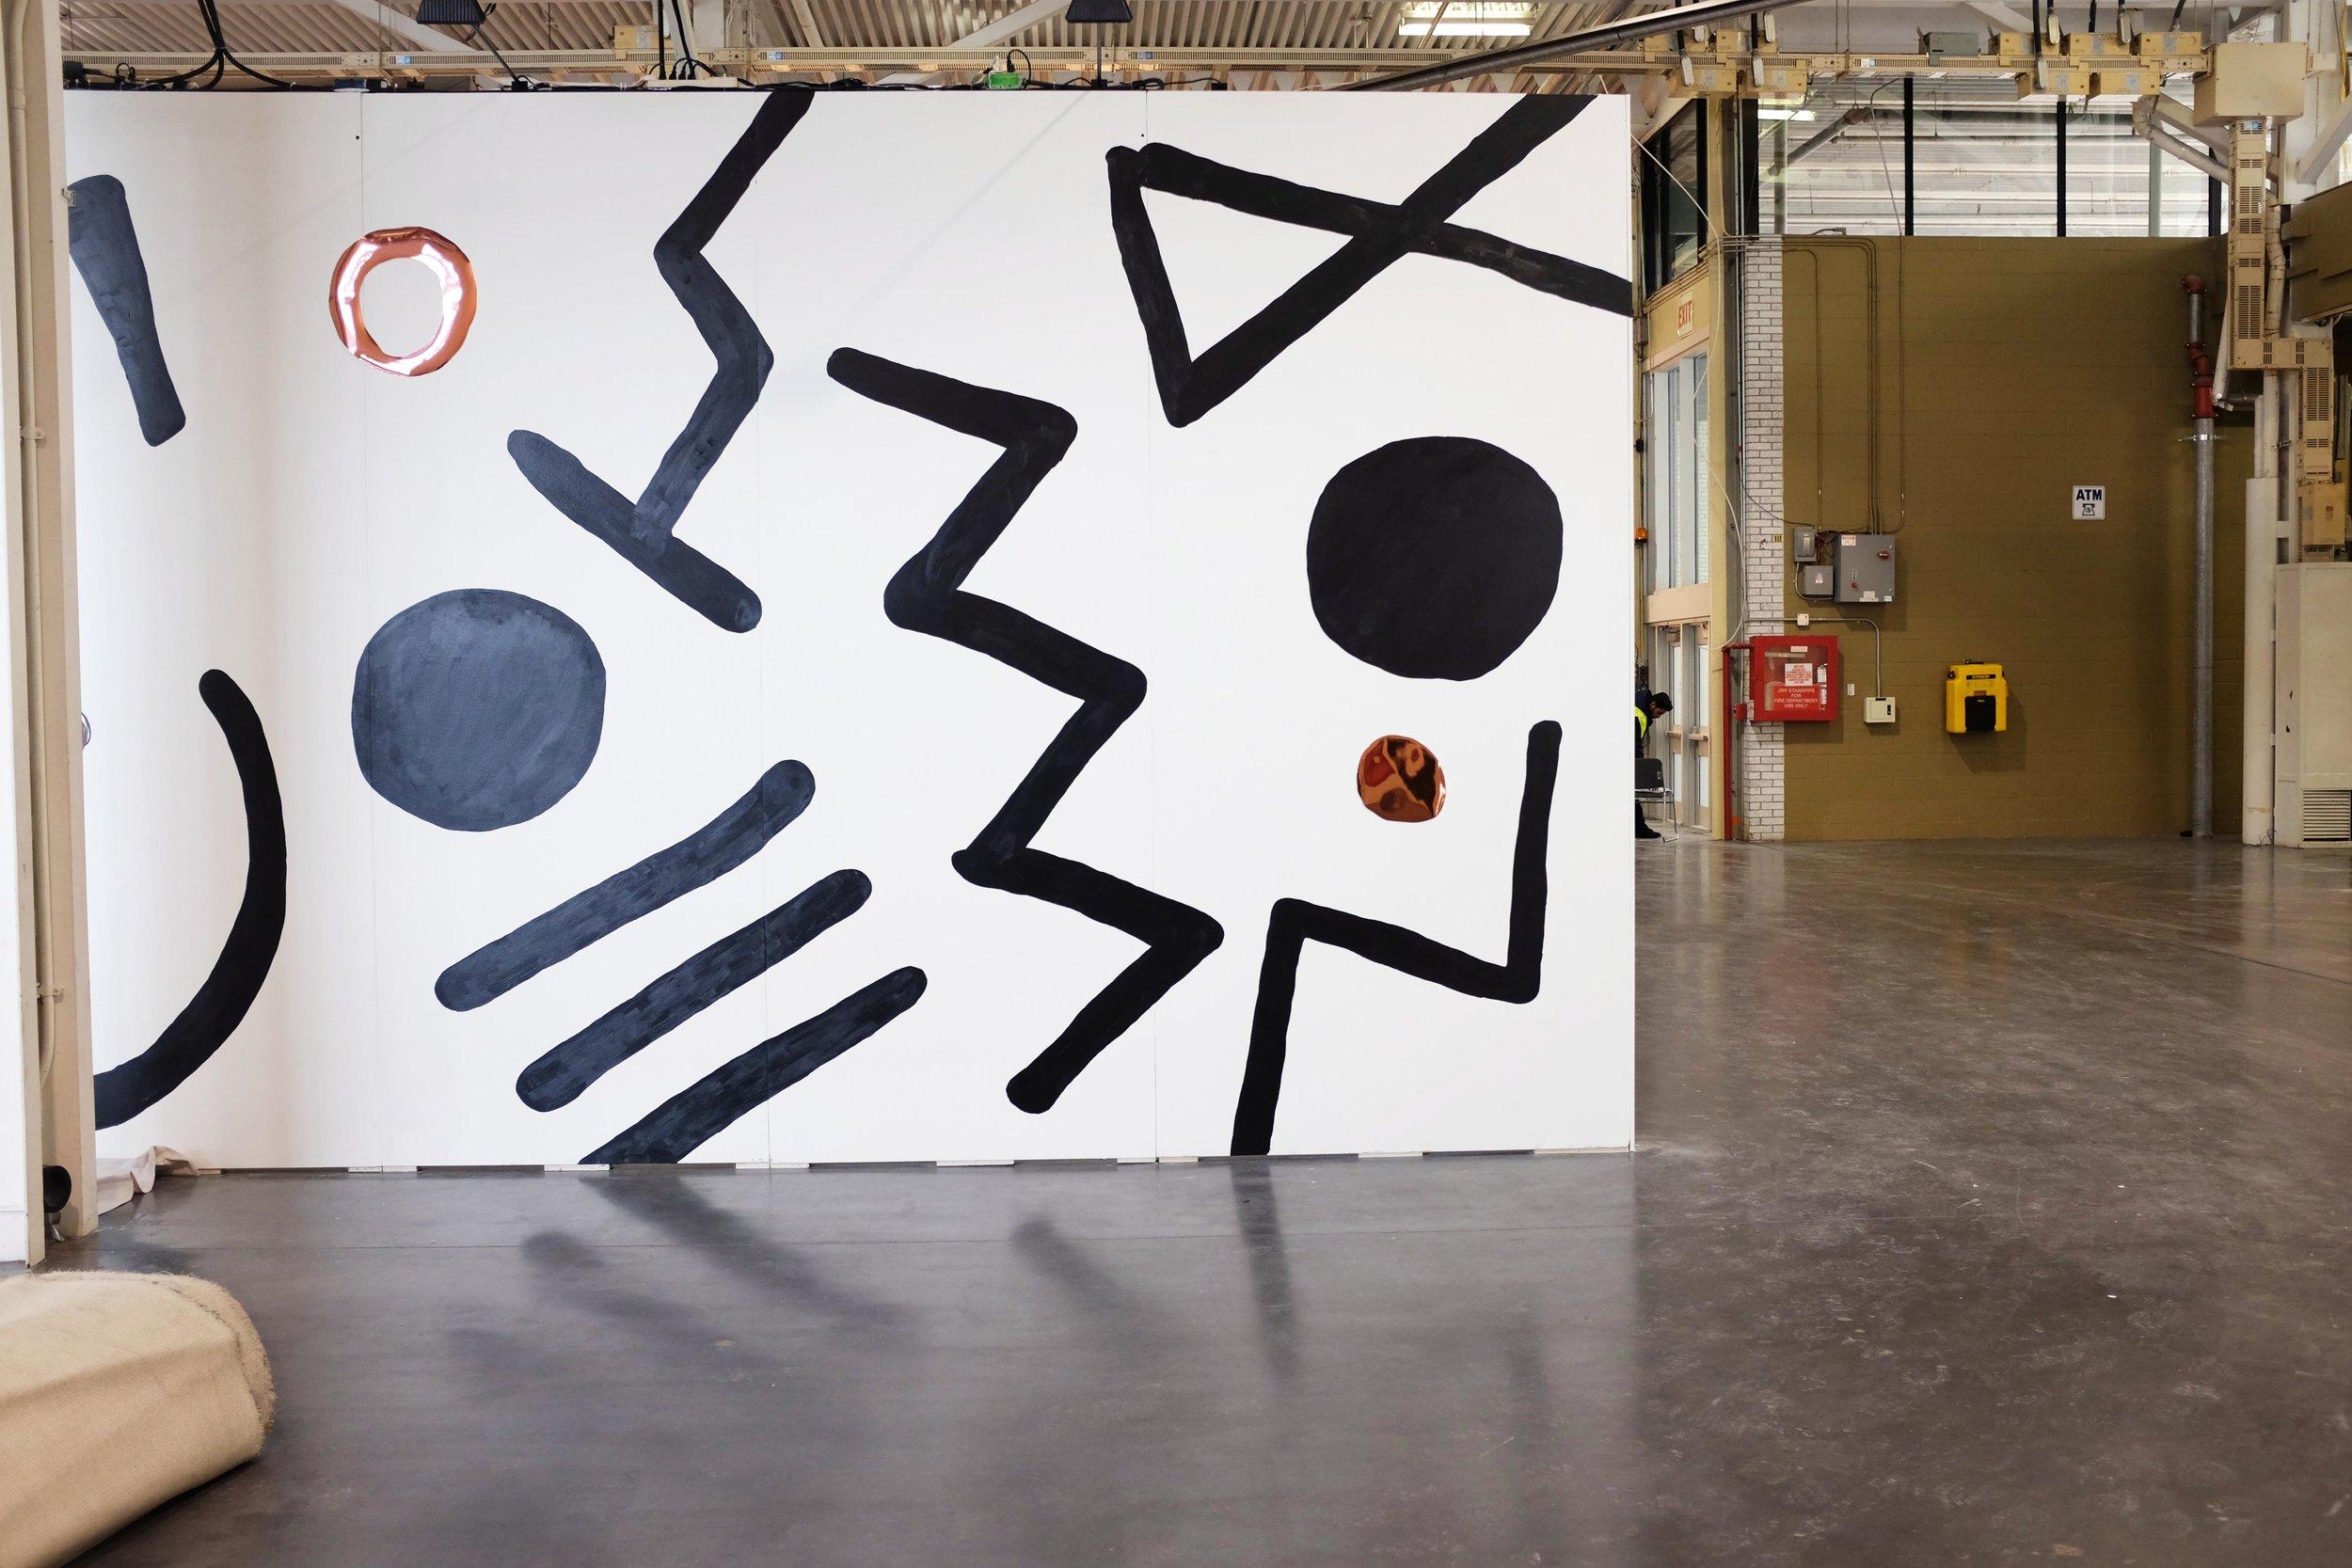 miss-cloudy-pauline-loctin-artist-project-2019-paper-art-origami-entrance-toronto-11.jpg